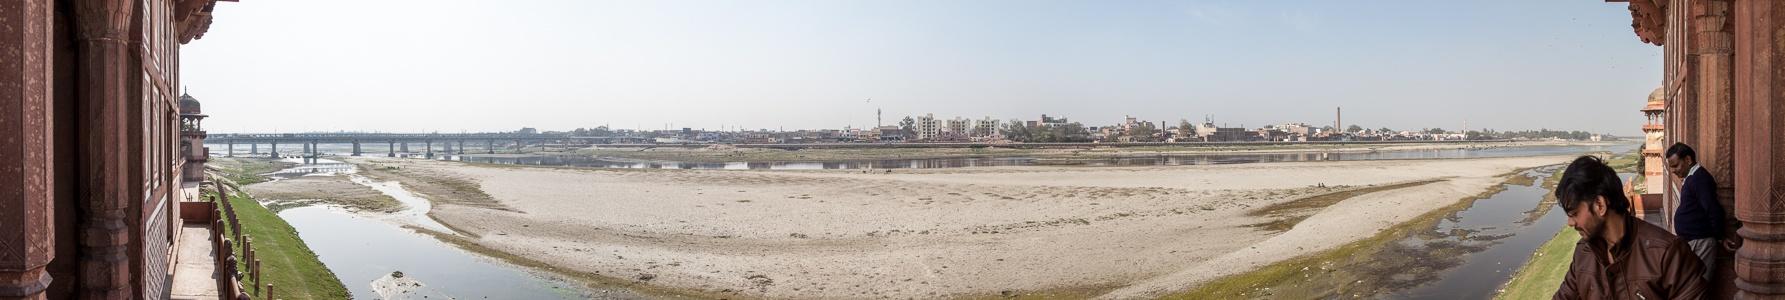 Agra Blick vom Itimad-ud-Daula-Mausoleum: Yamuna Ambedkar Bridge